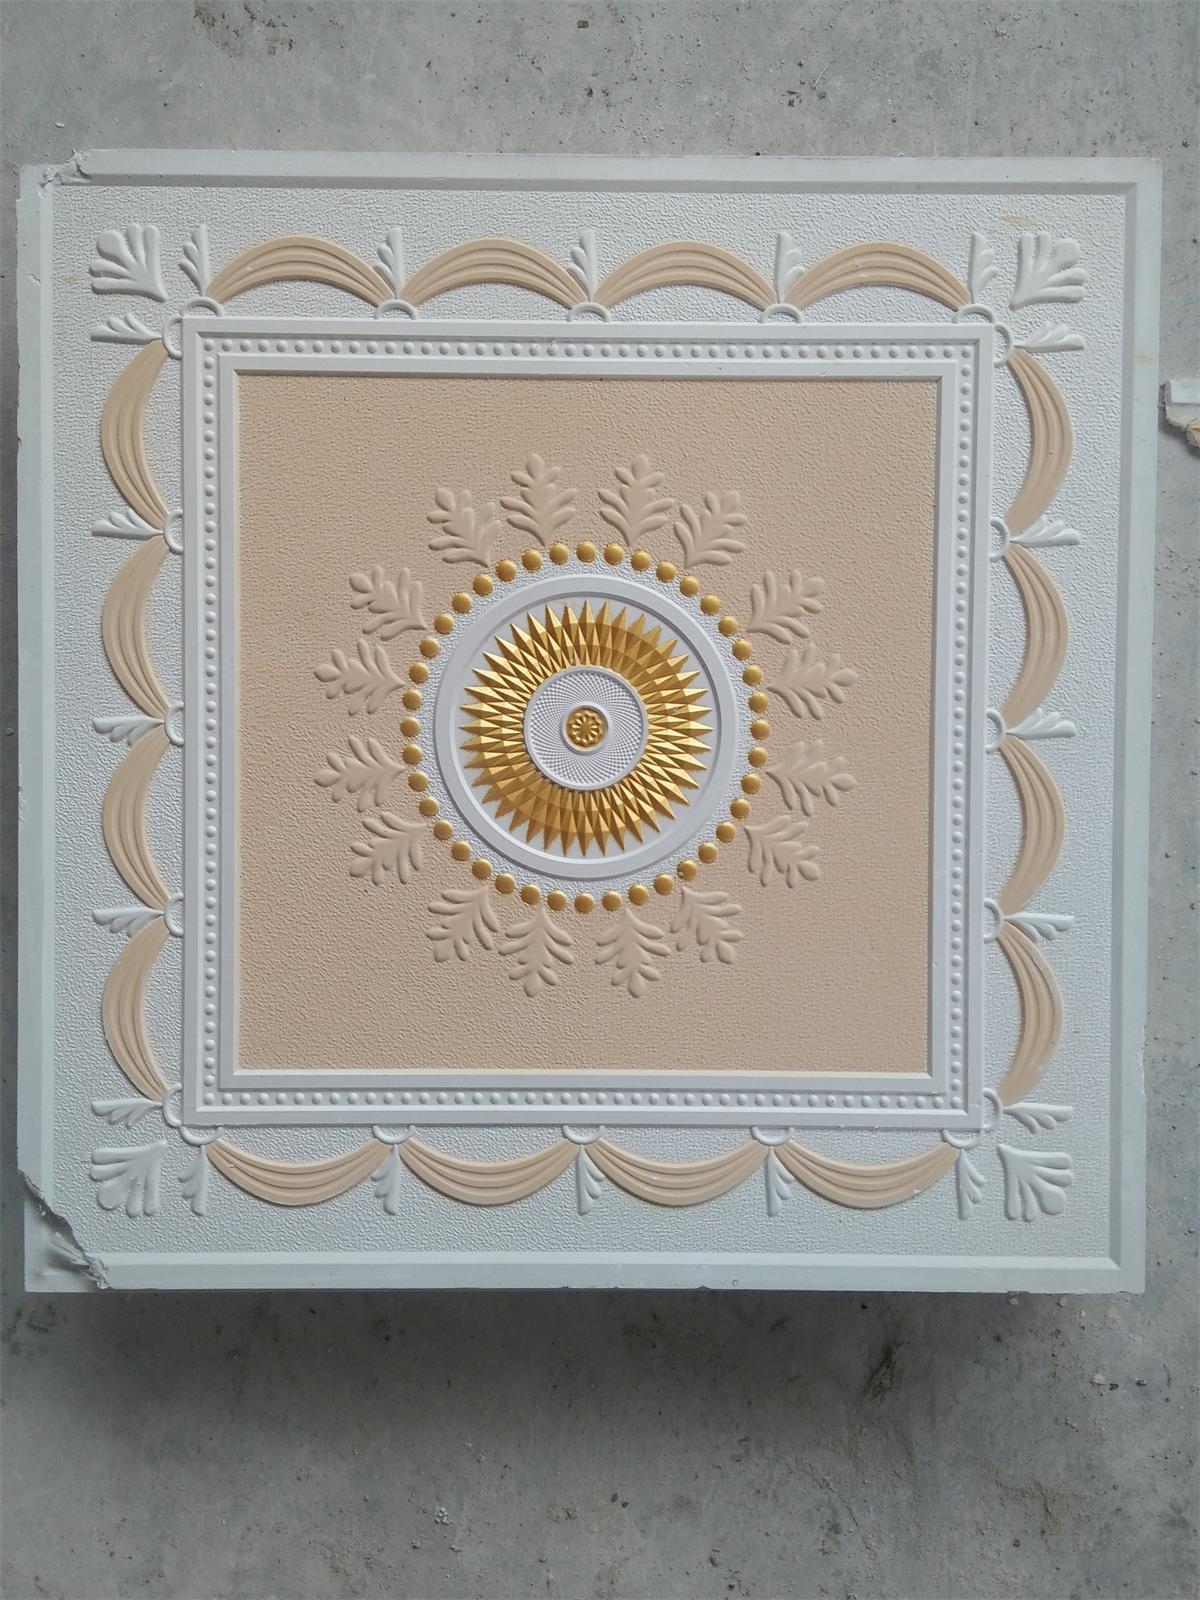 China calcium silicate tile acoustic grg gypsum ceiling tile photos calcium silicate tile acoustic grg gypsum ceiling tile dailygadgetfo Images